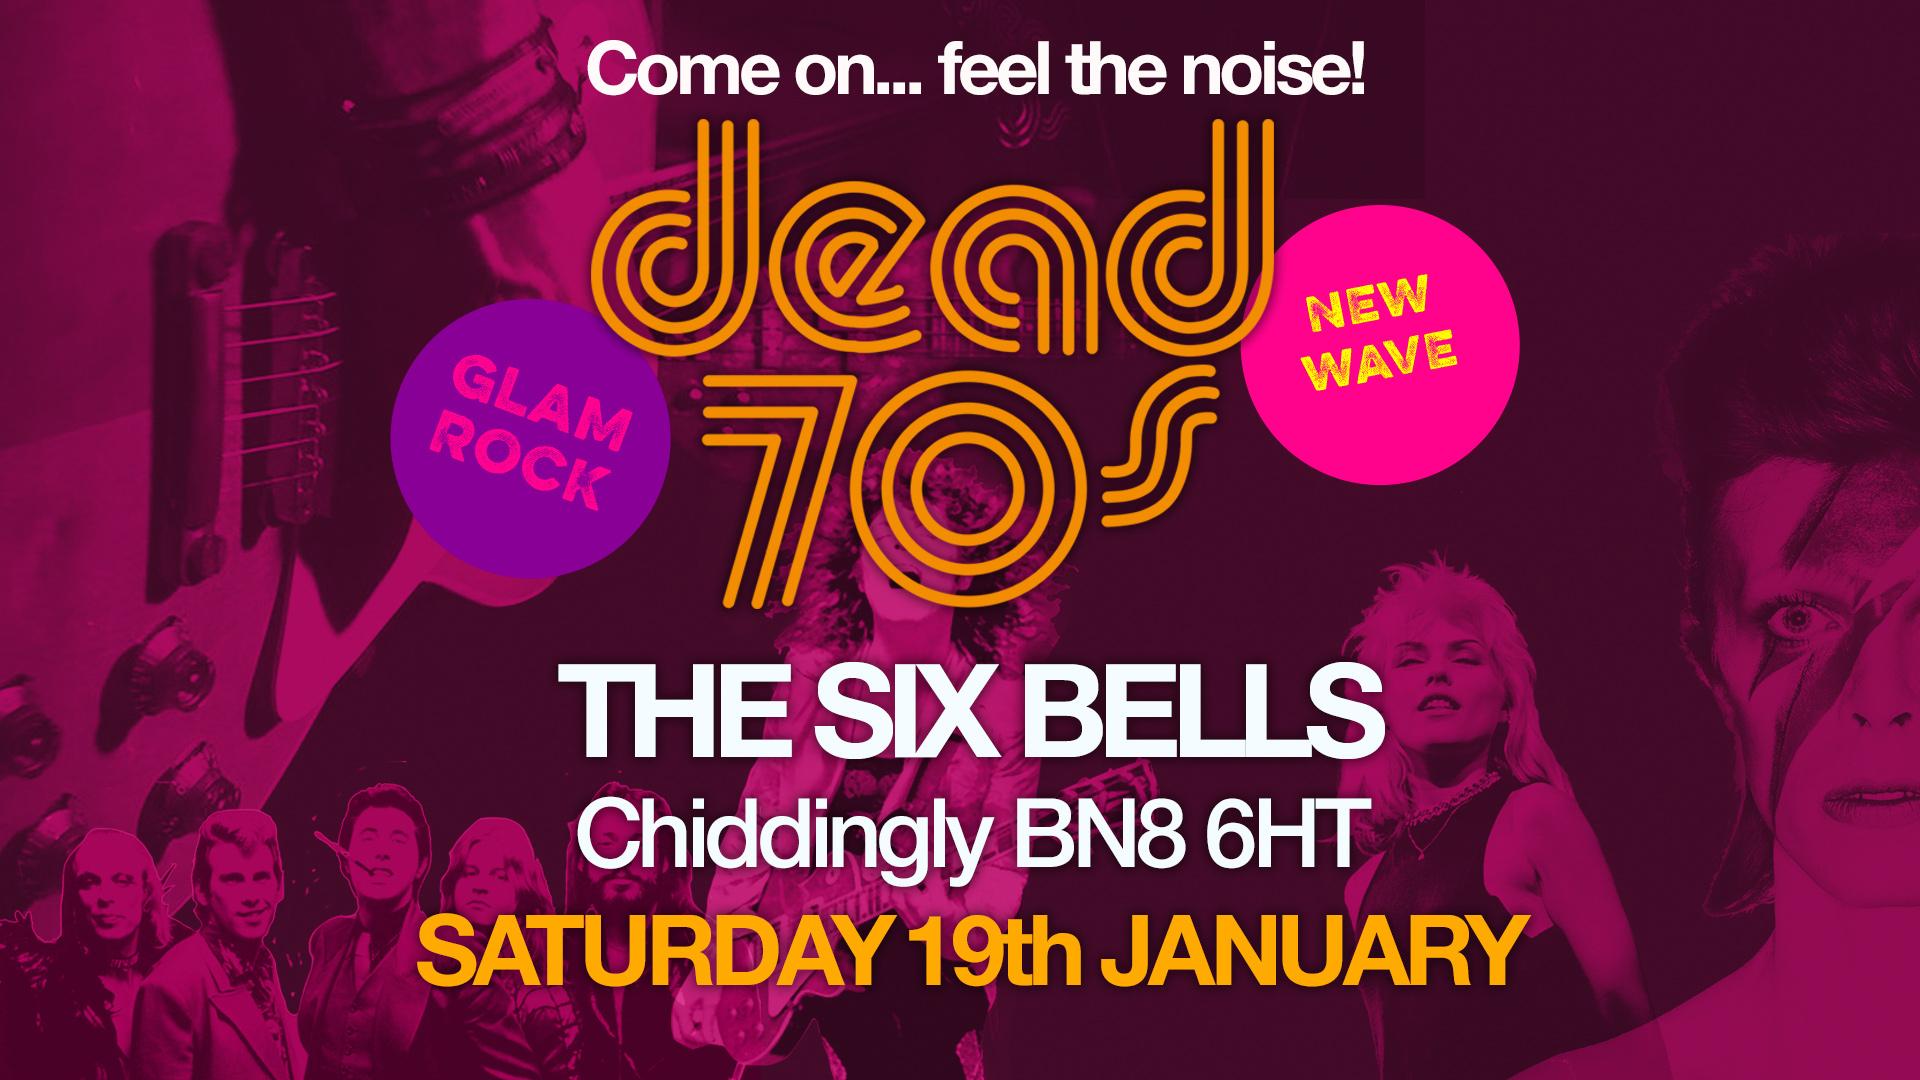 The Six Bells, Chiddingly